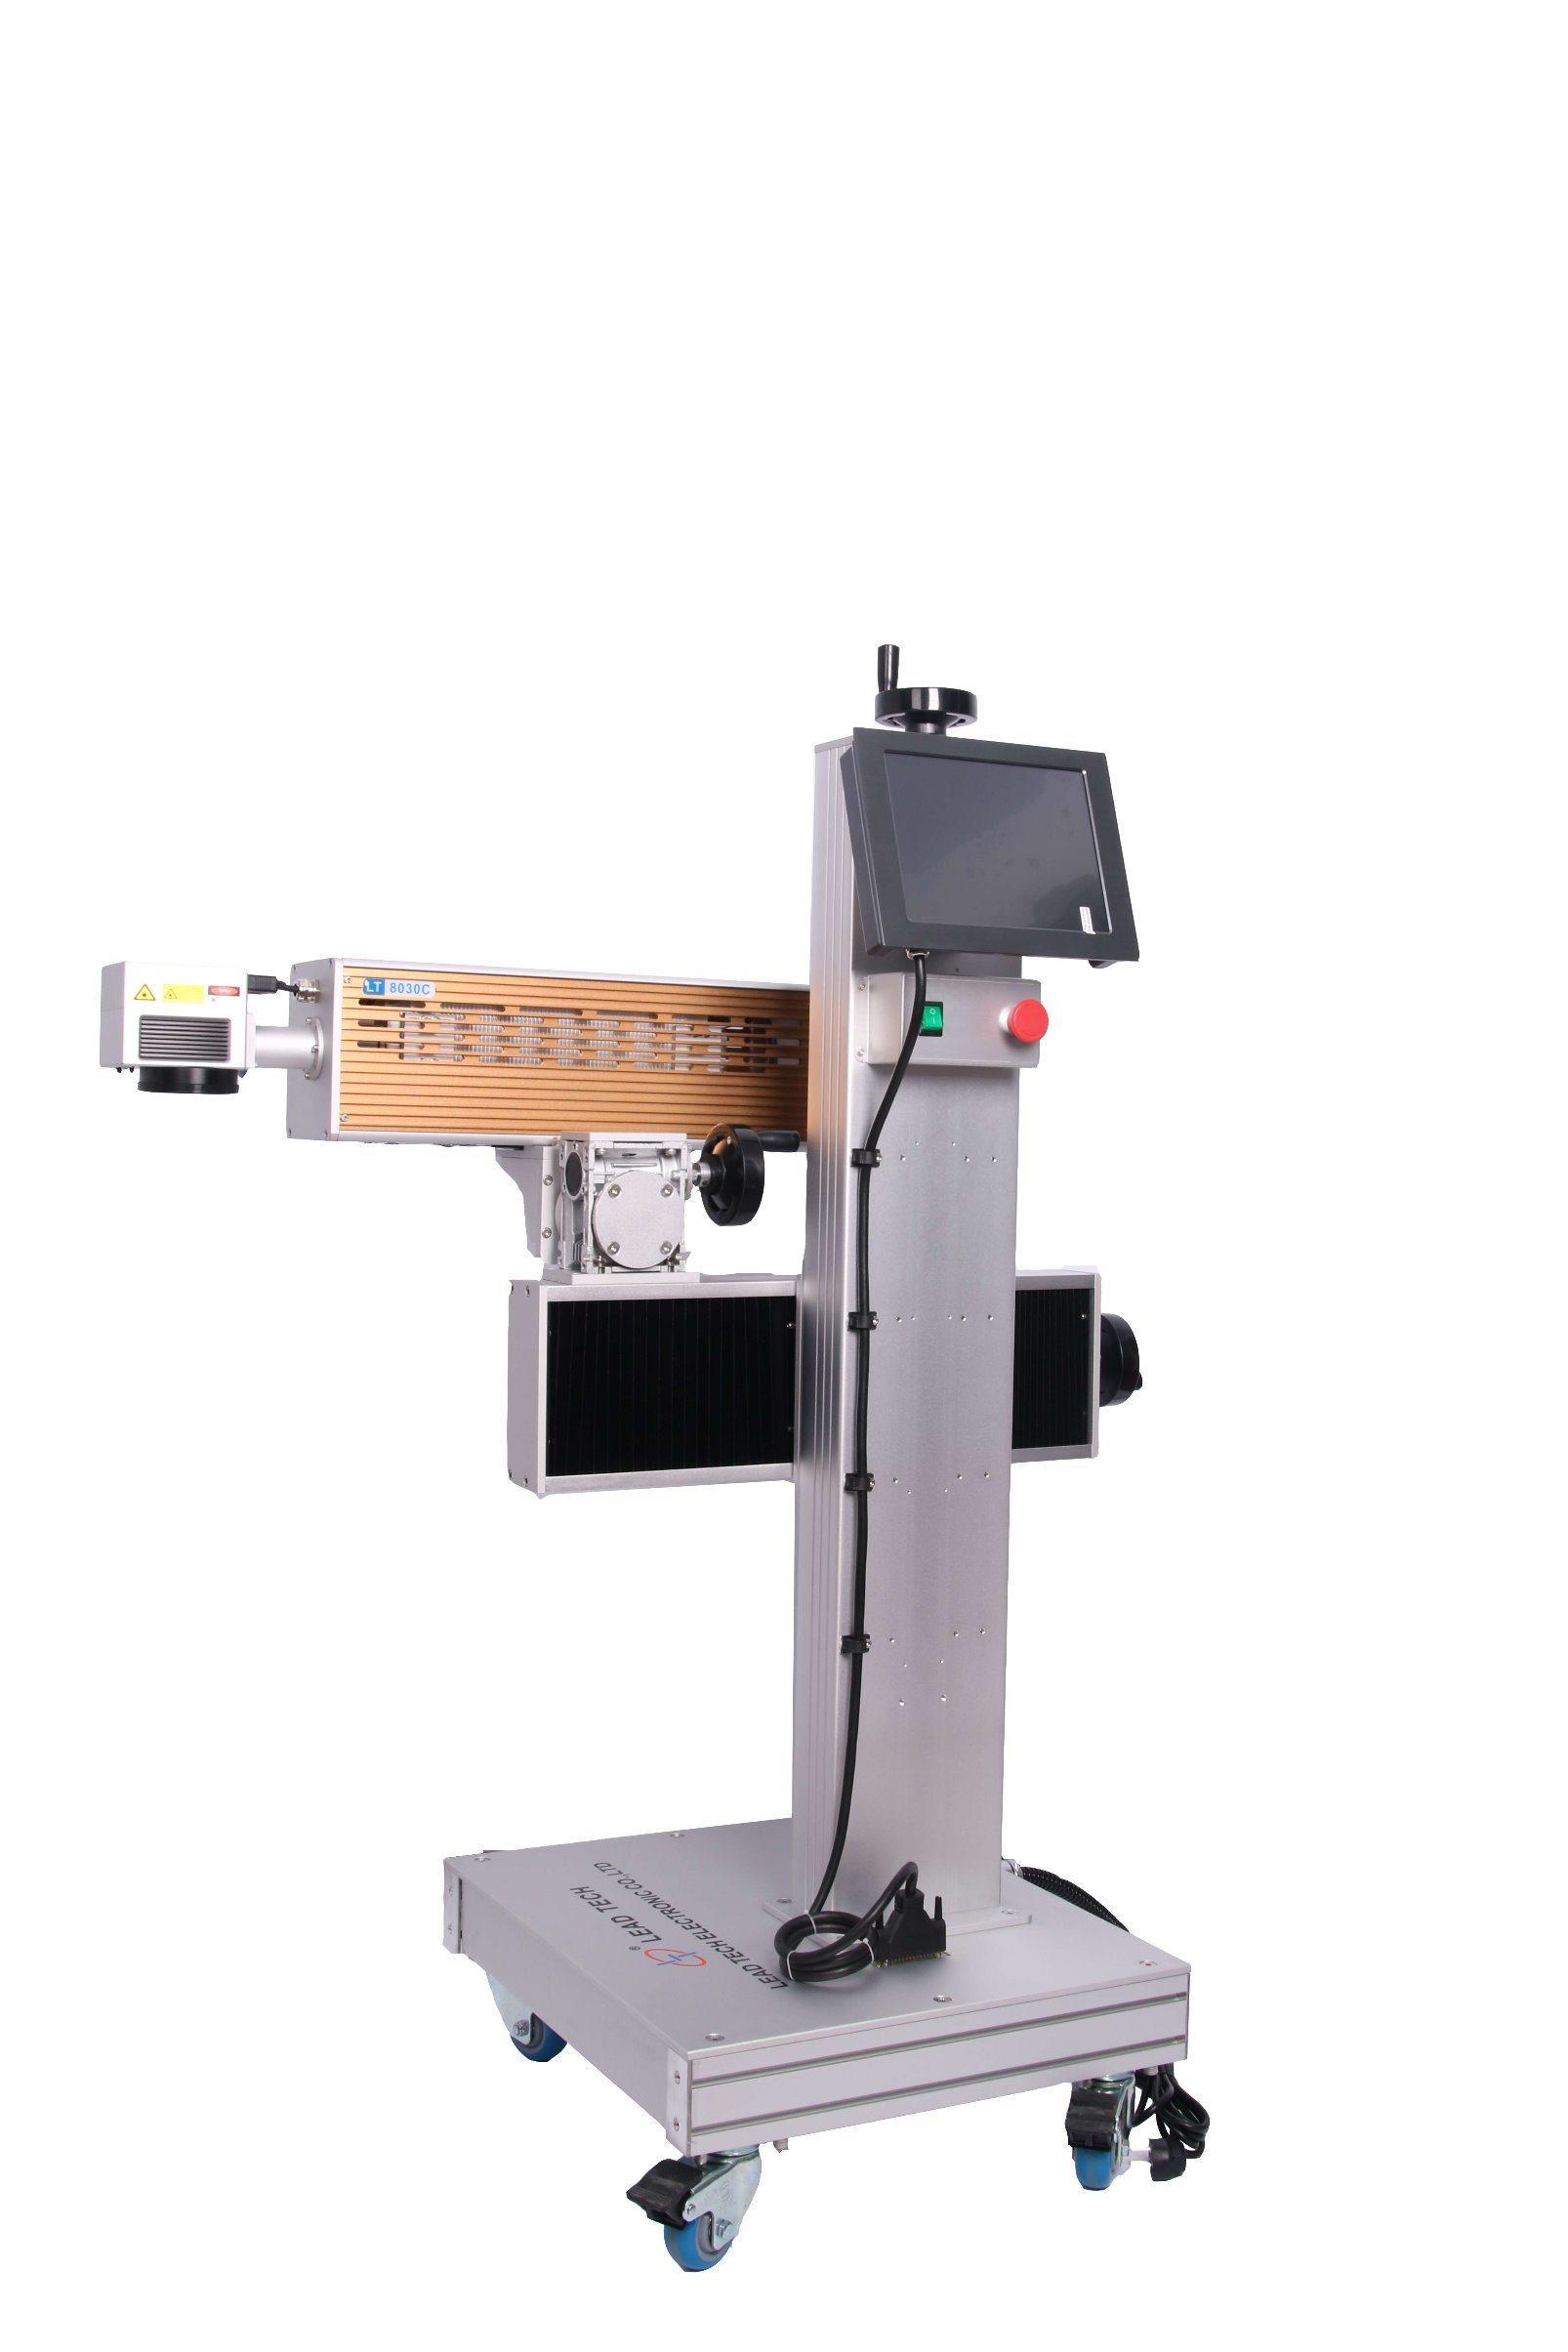 Lt8020c/Lt8030c CO2 20W/30W High Speed Fly Laser Marking Printer for PPR/PE/PVC Pipe Marking